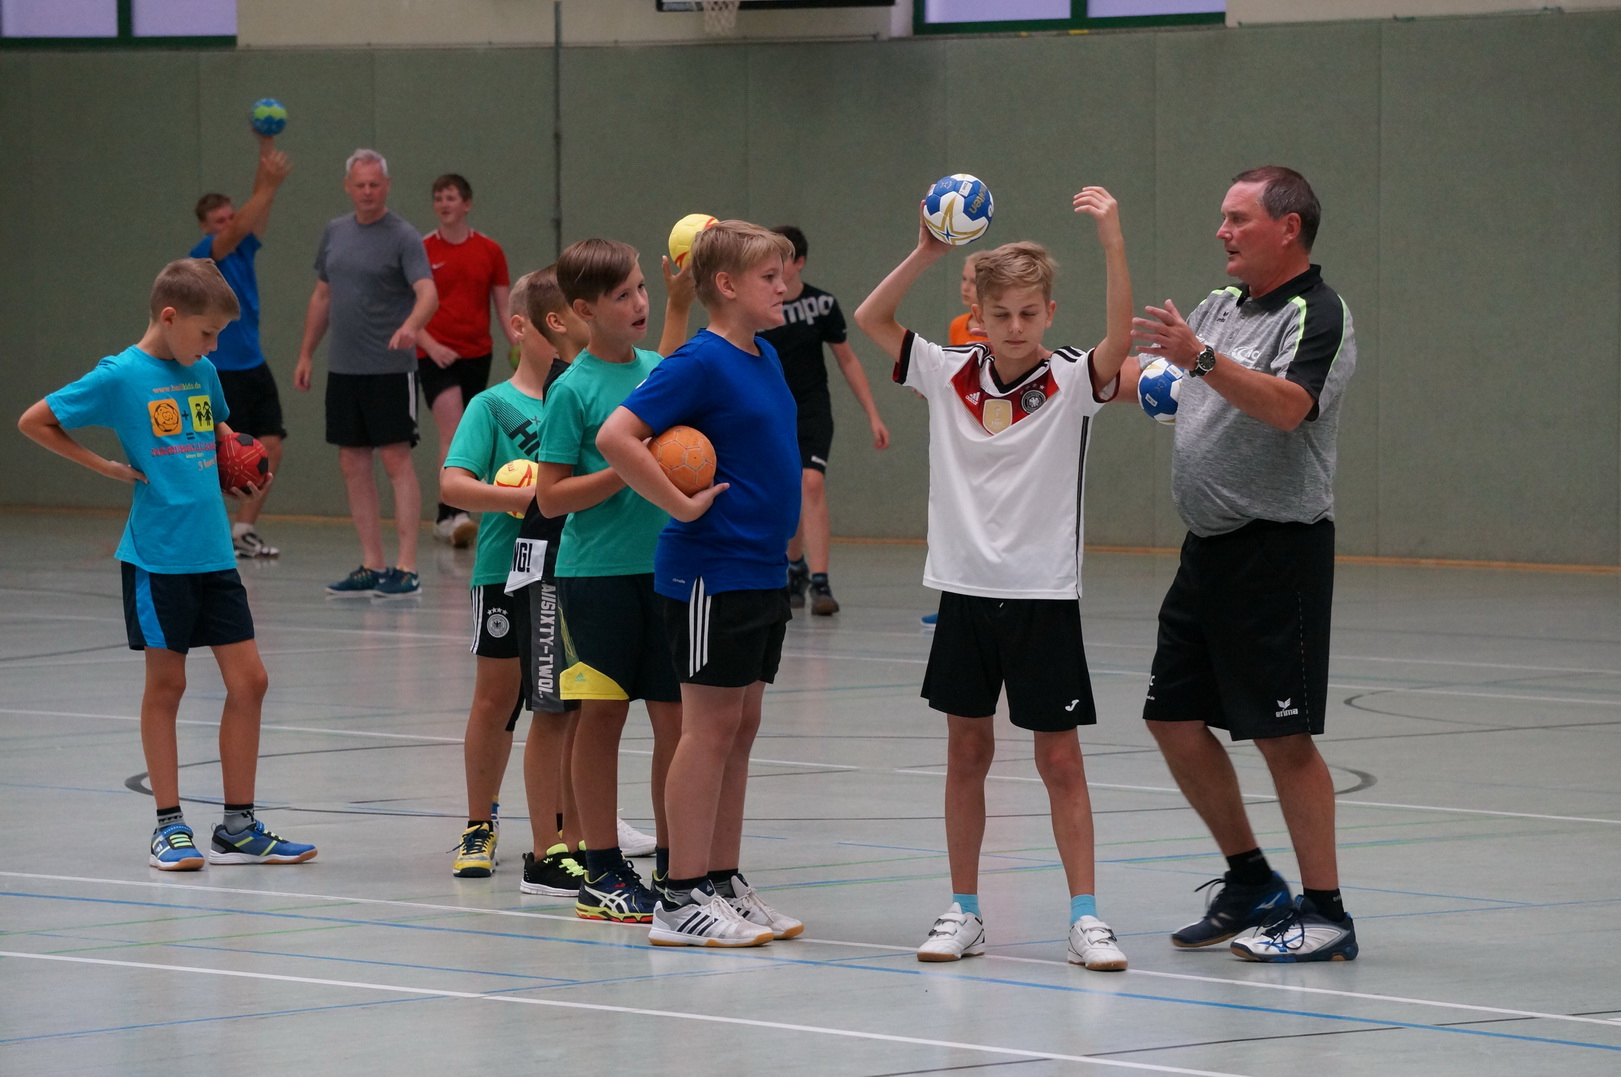 201808_Handballcamp_SDH_MG_075w